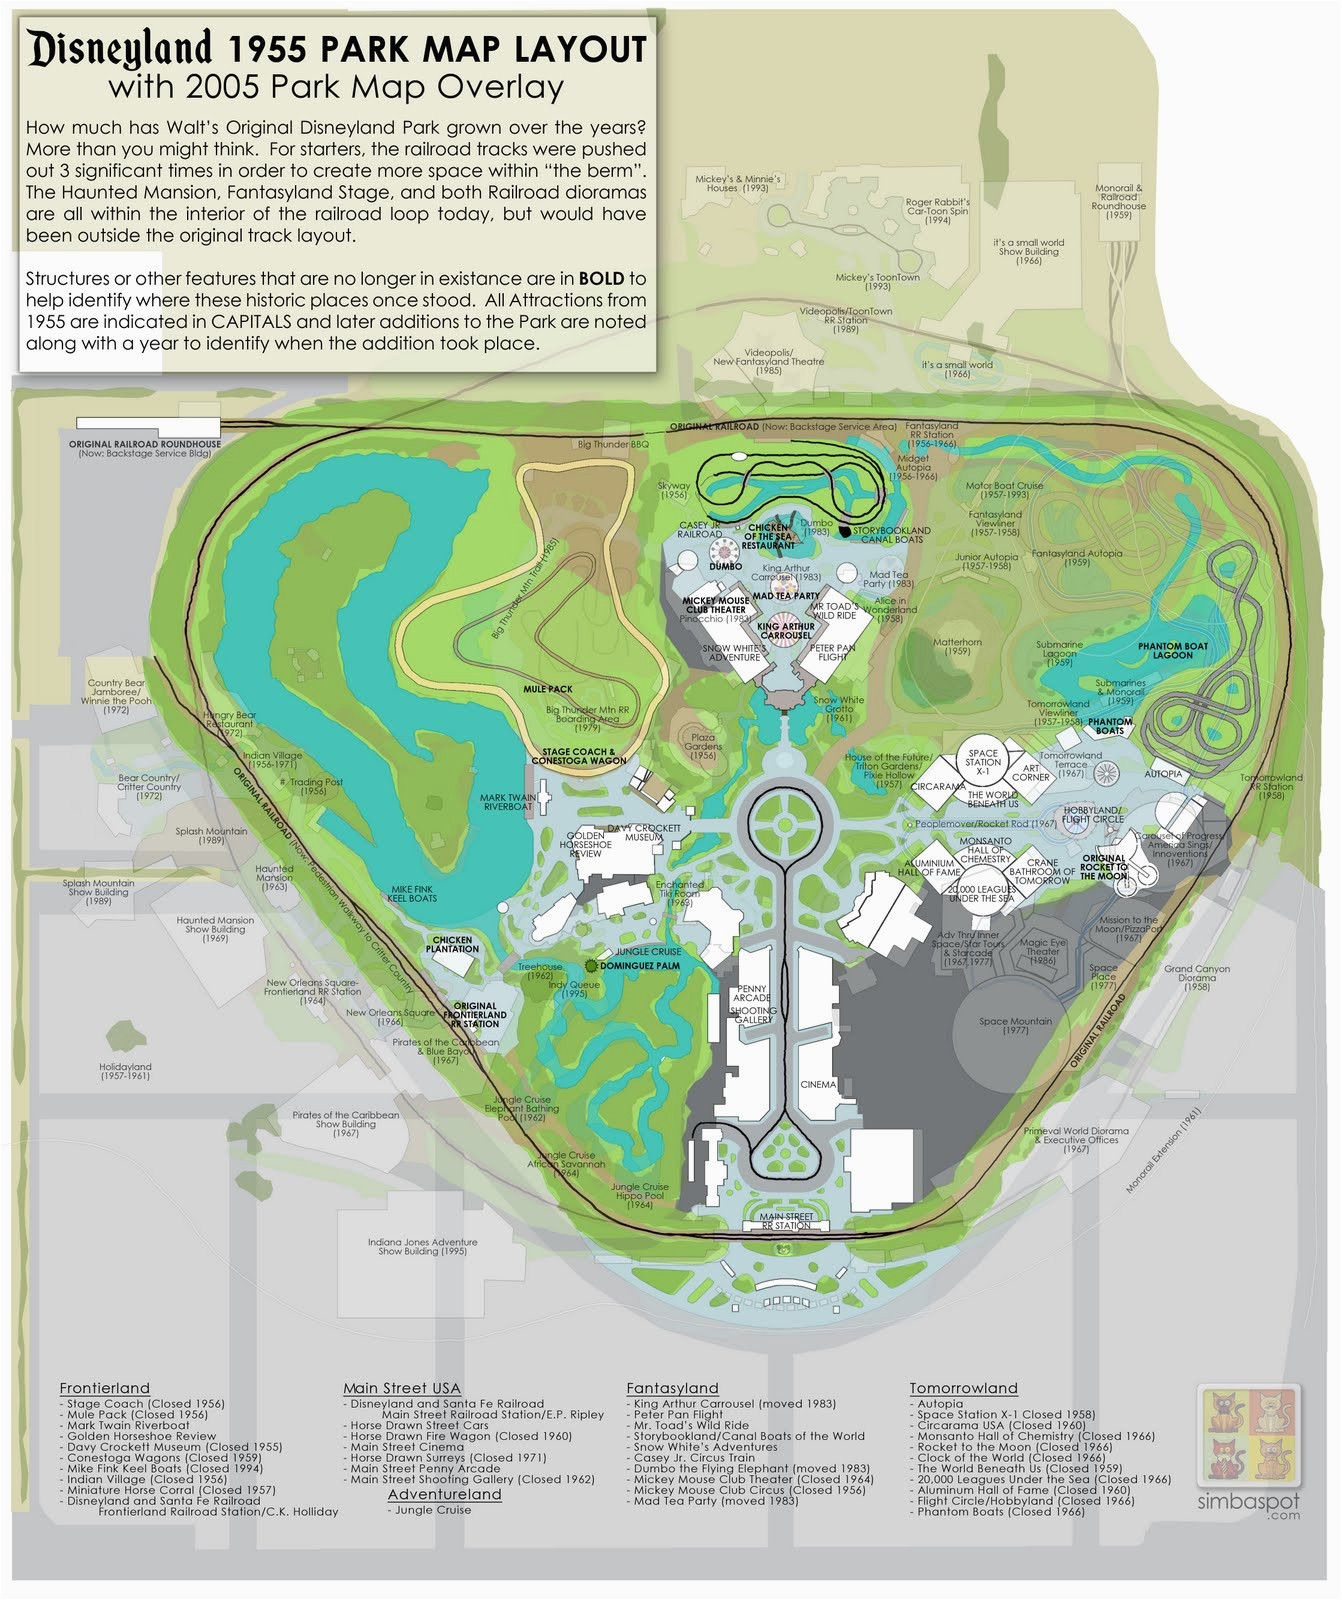 Downtown Disney Map California Downtown Disney Map California Free on